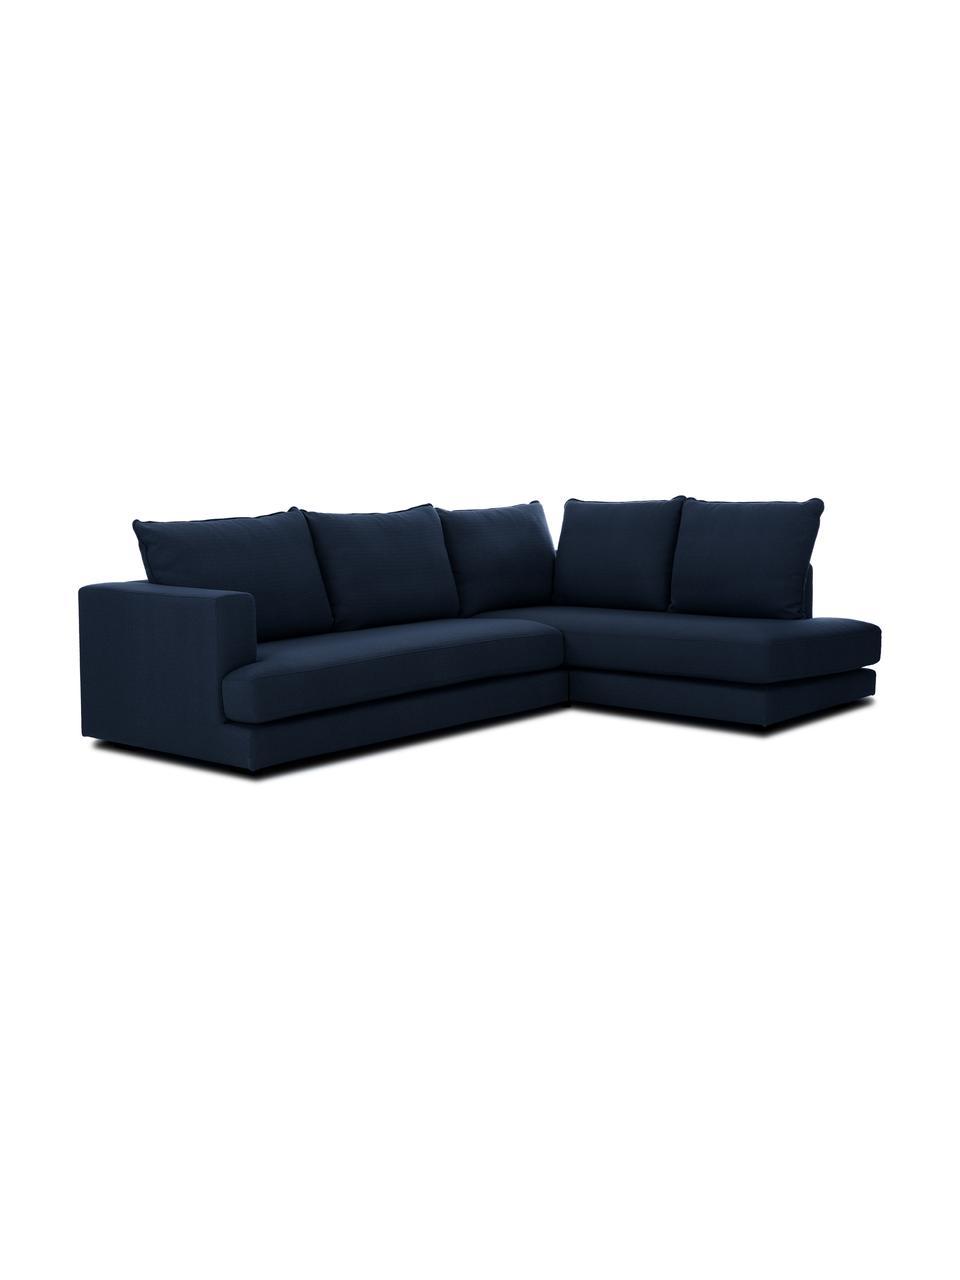 Grand canapé d'angle bleu foncé Tribeca, Tissu bleu foncé